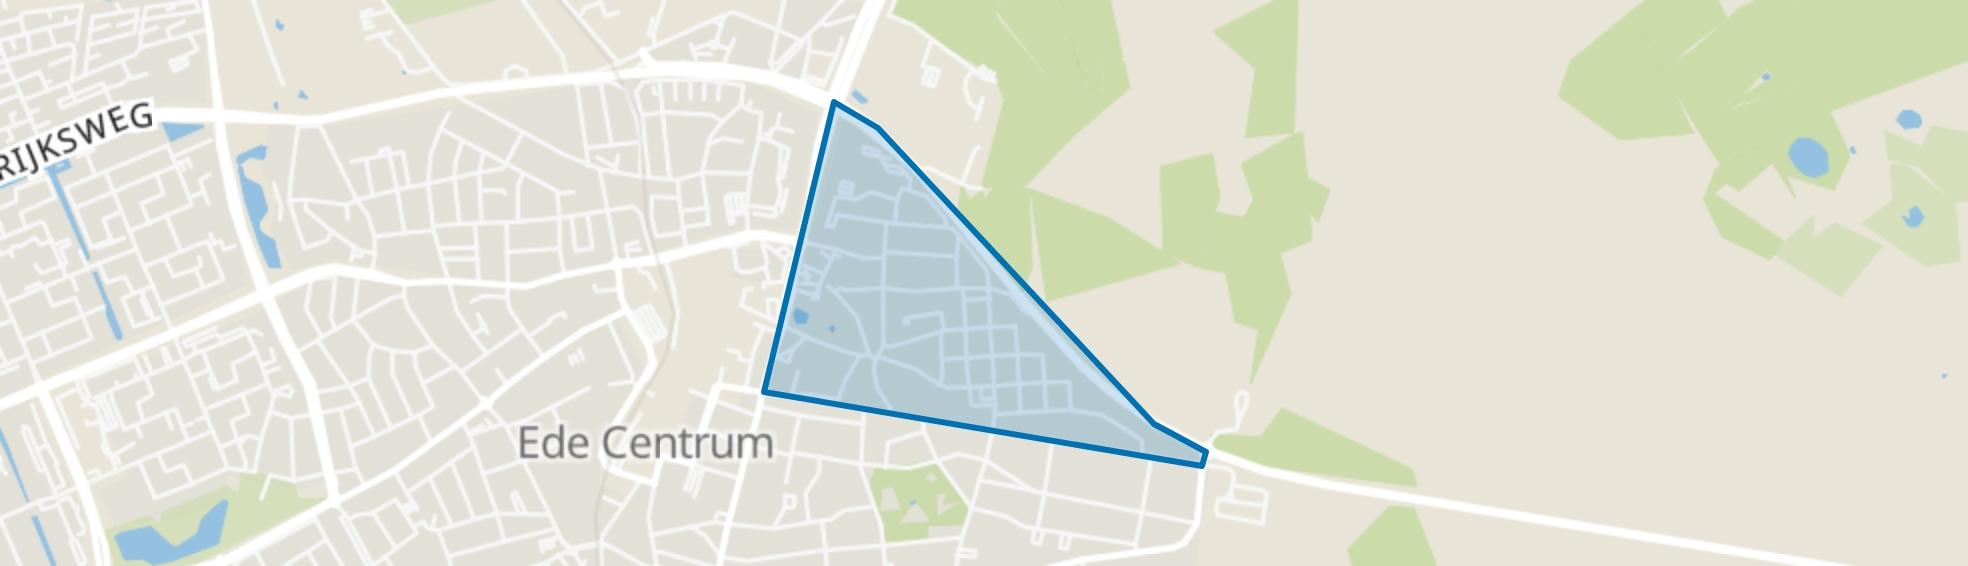 Komponistenbuurt, Ede map